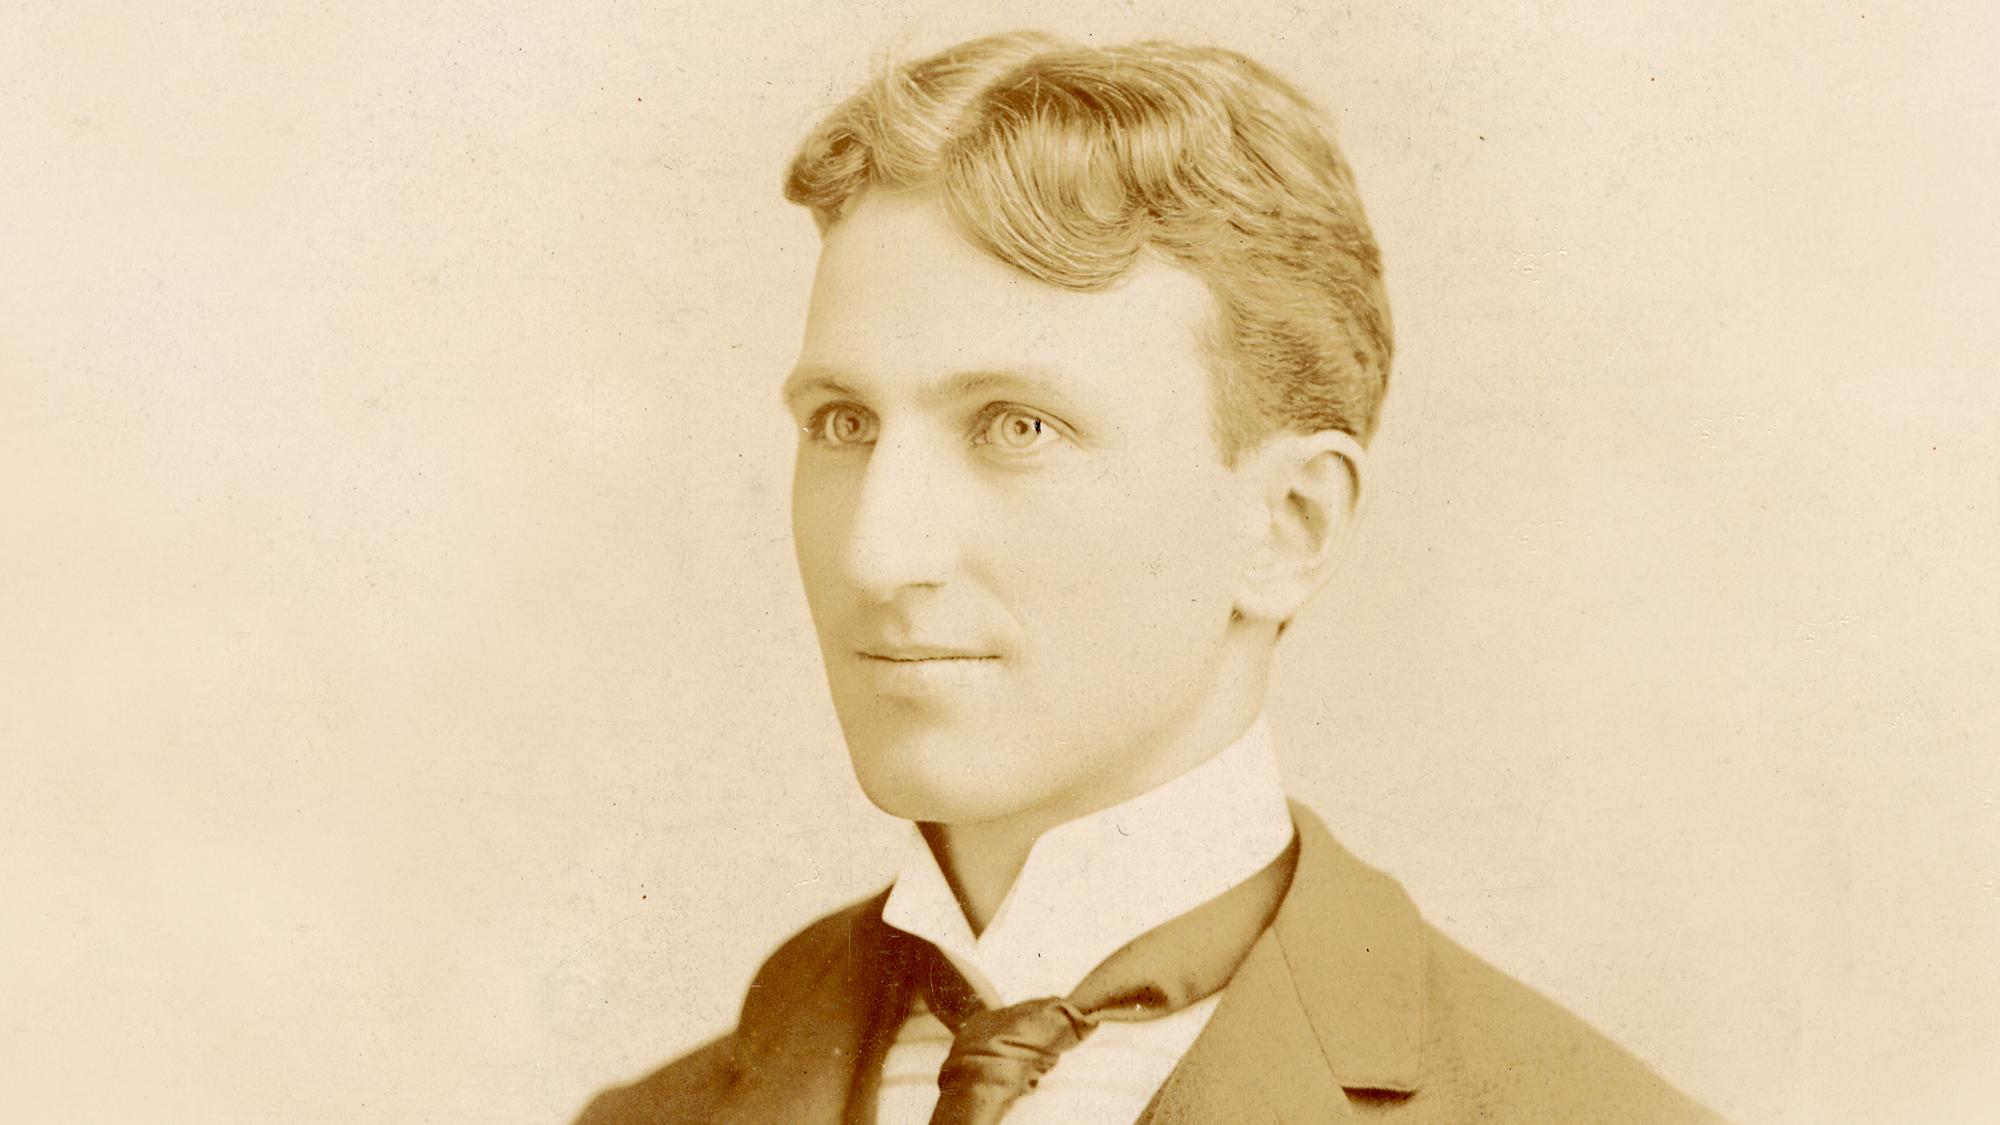 Herbert F. Johnson, Sr. joins the family company business in 1892